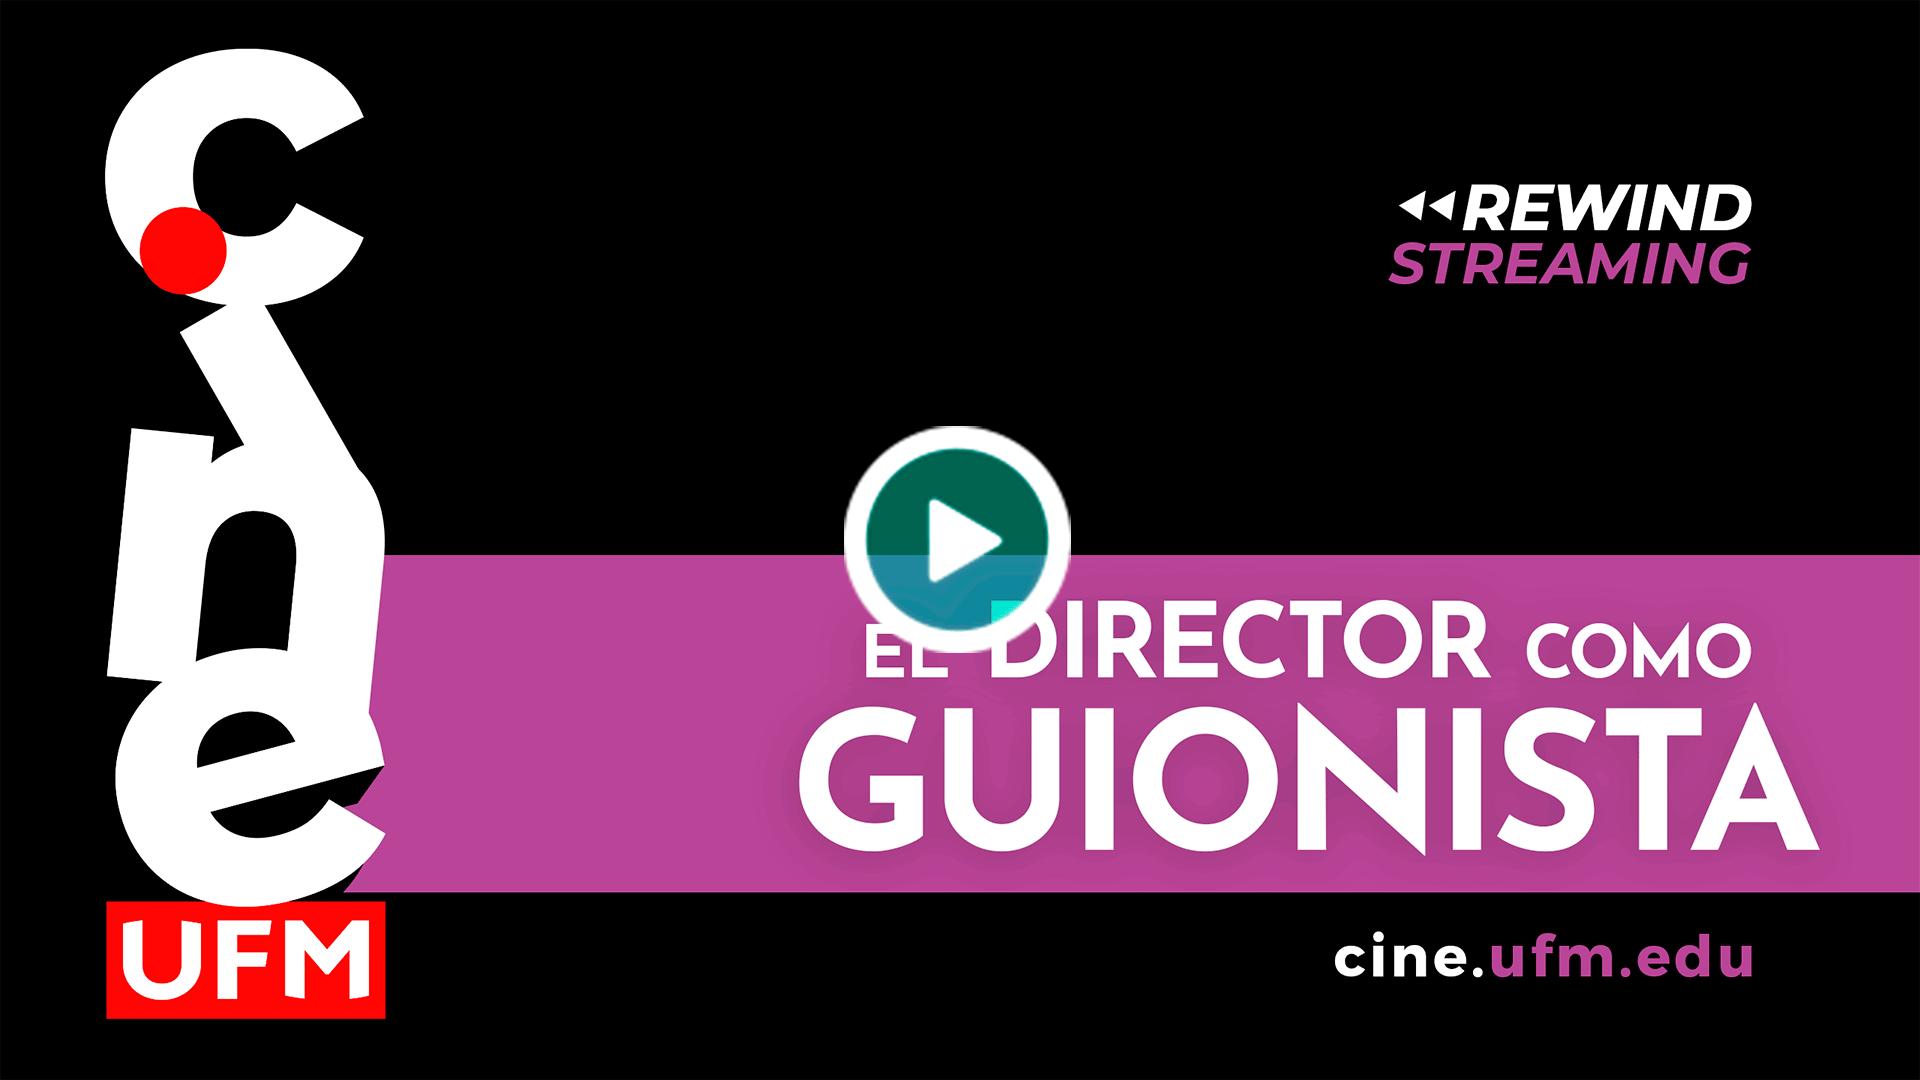 20200605_cineufmlive1_Director-Guionista_Cine-LIVE